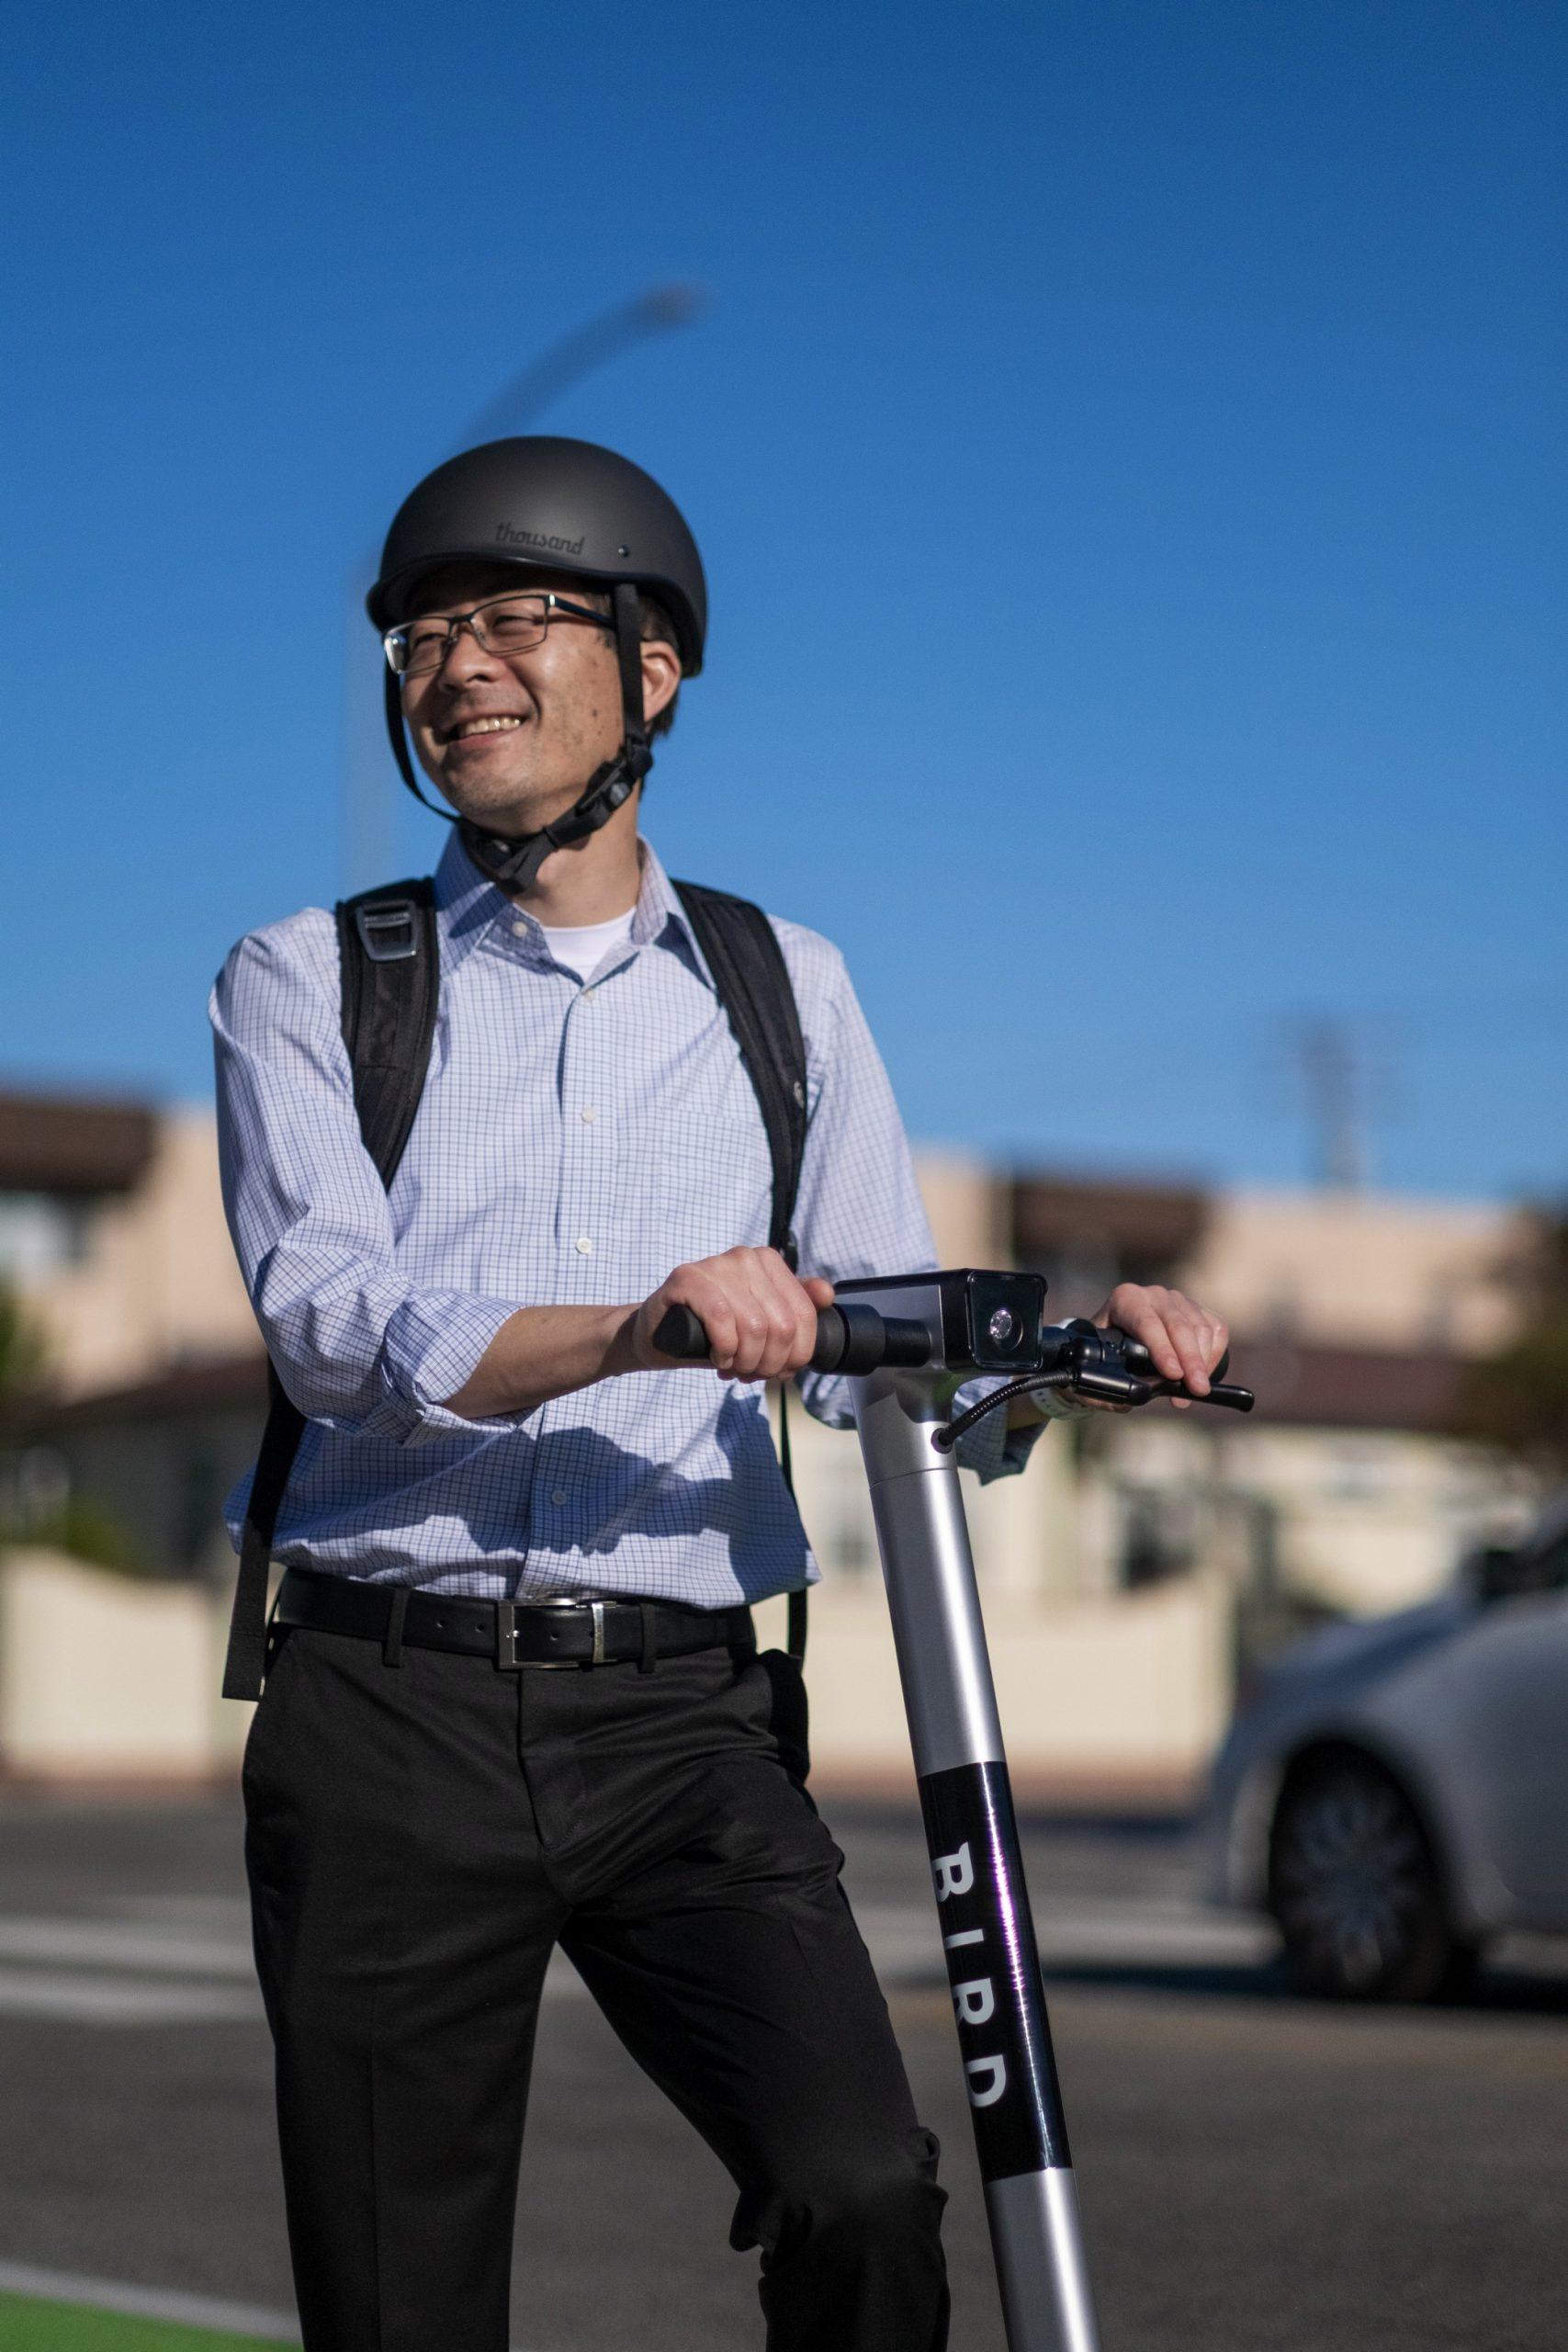 Man wearing Bird helmet and backpack, holding handlebars of Bird scooter